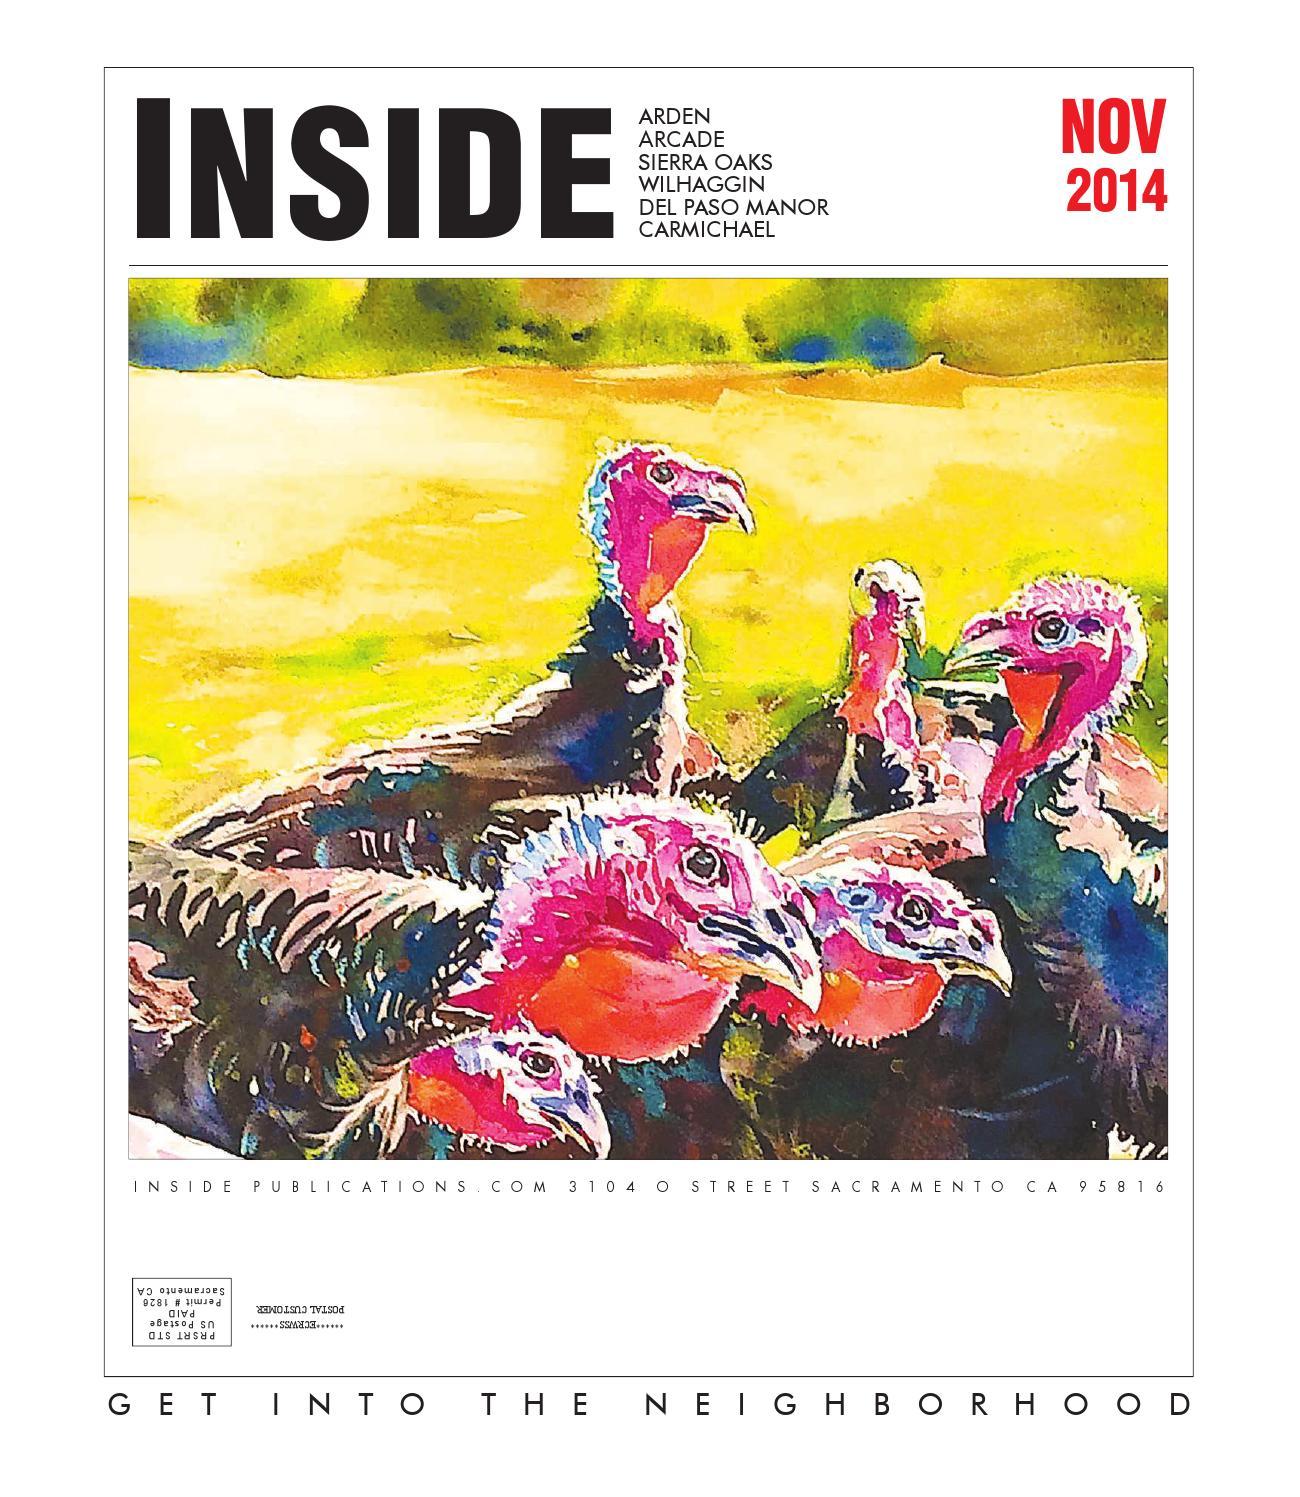 Inside arden nov 2014 by Inside Publications issuu